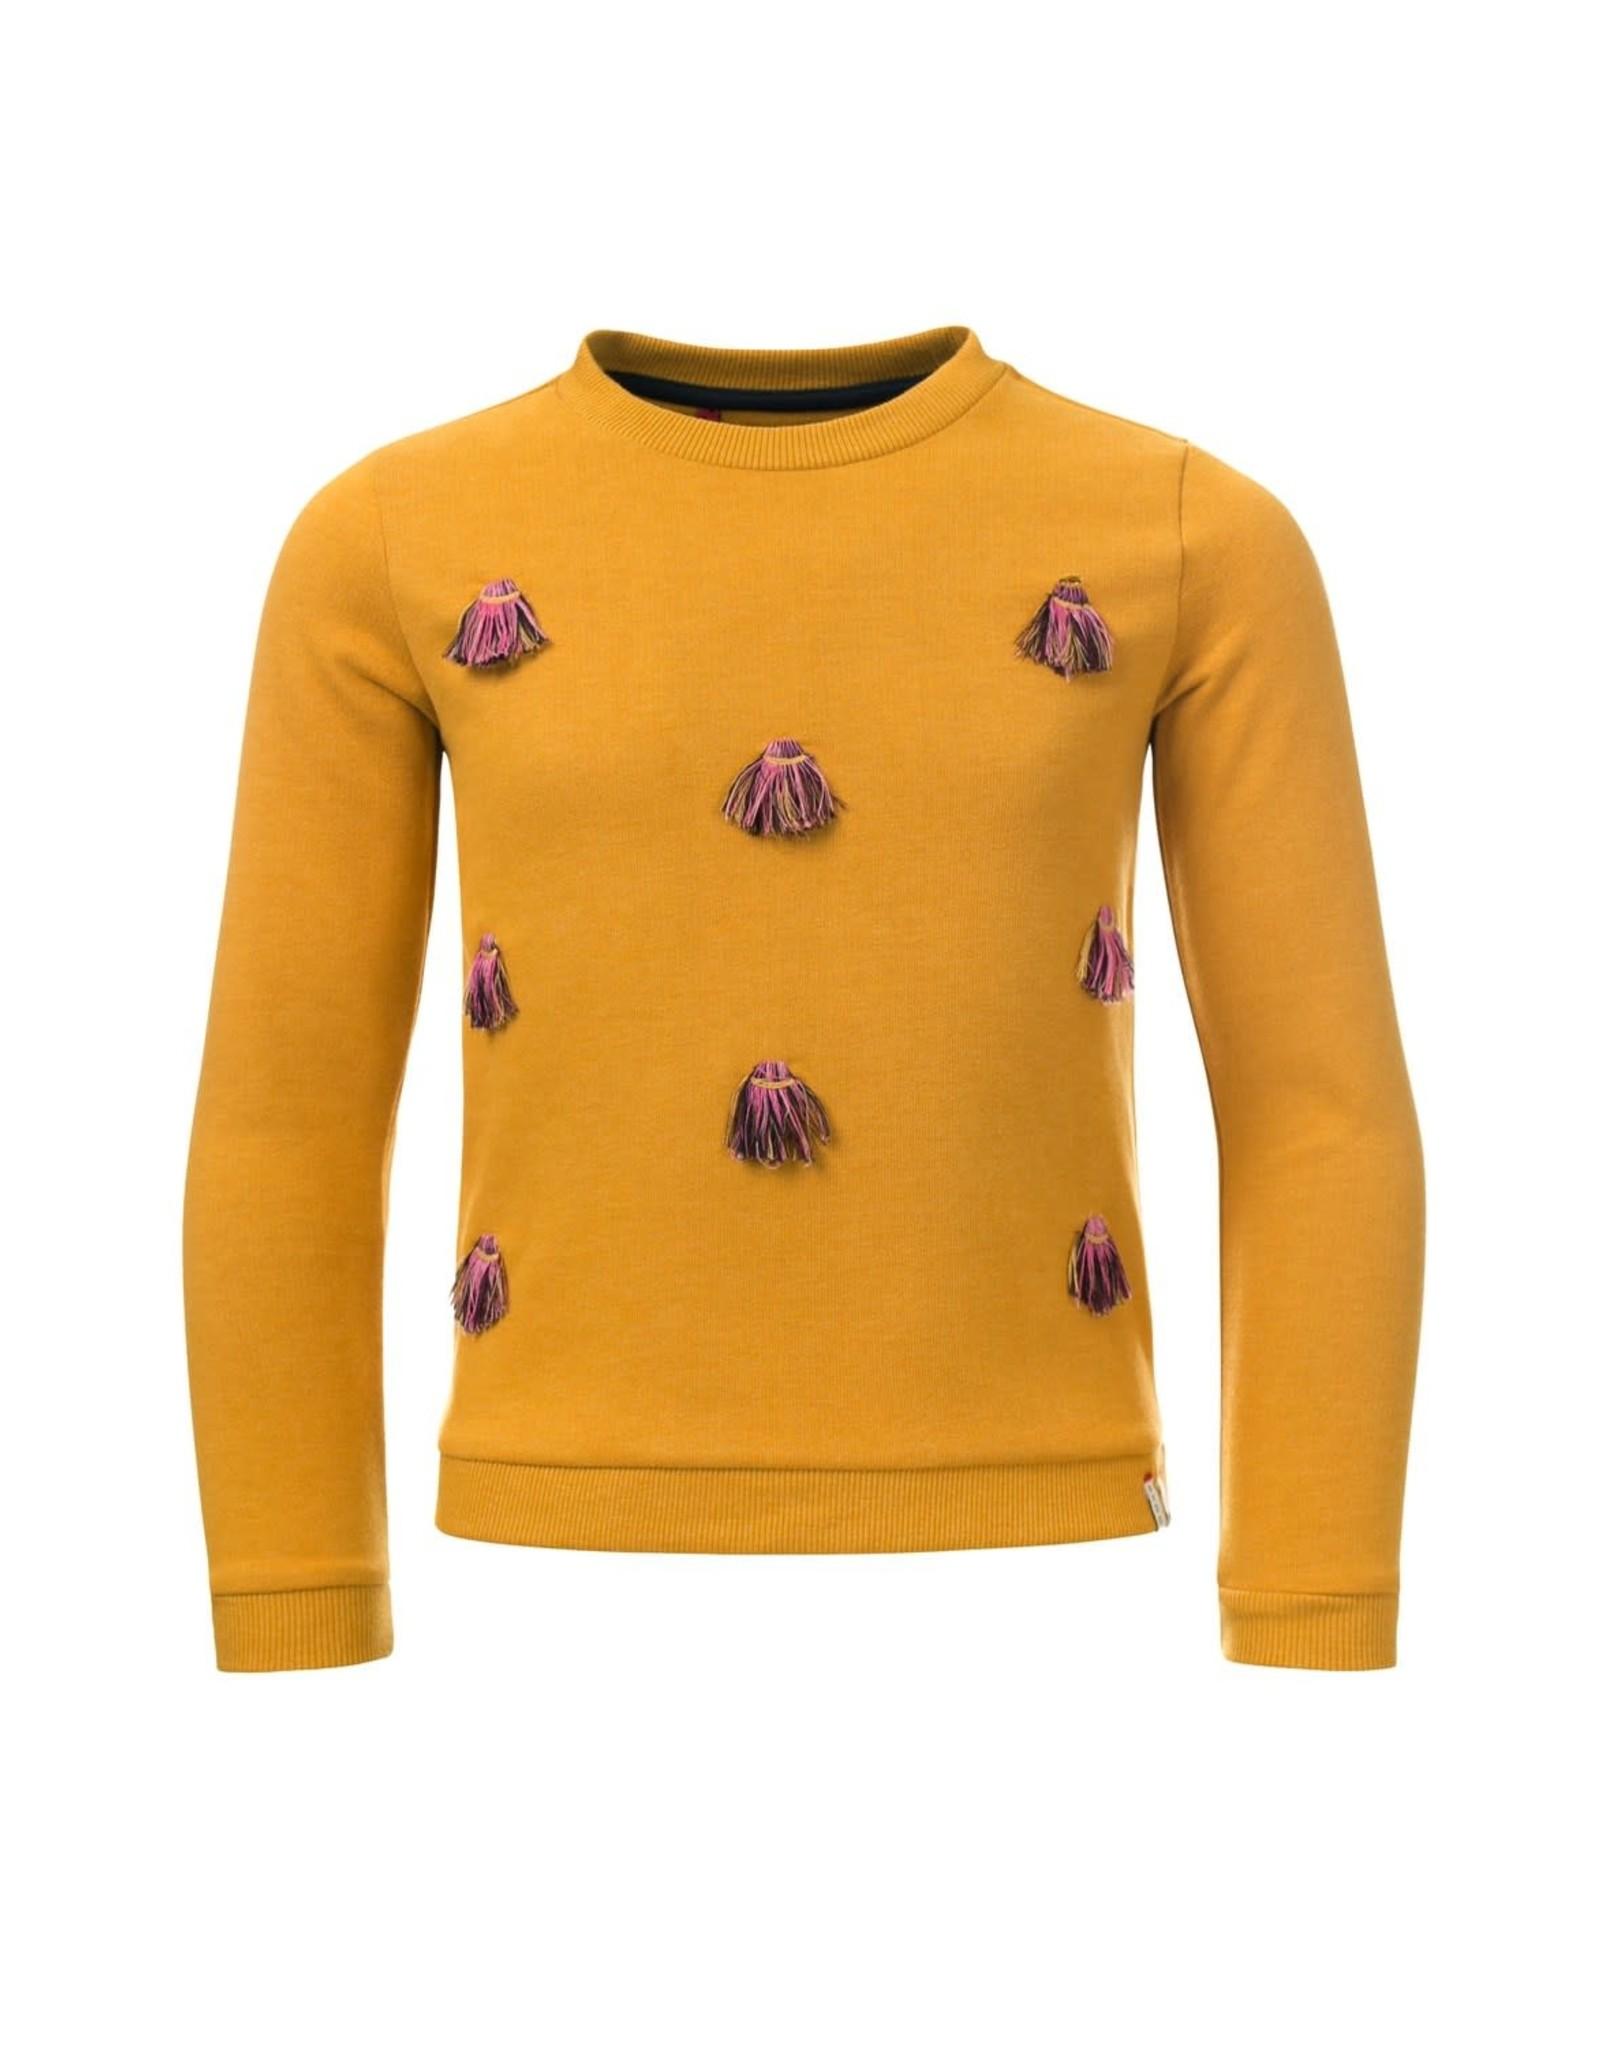 Looxs Little Sweater Mustard